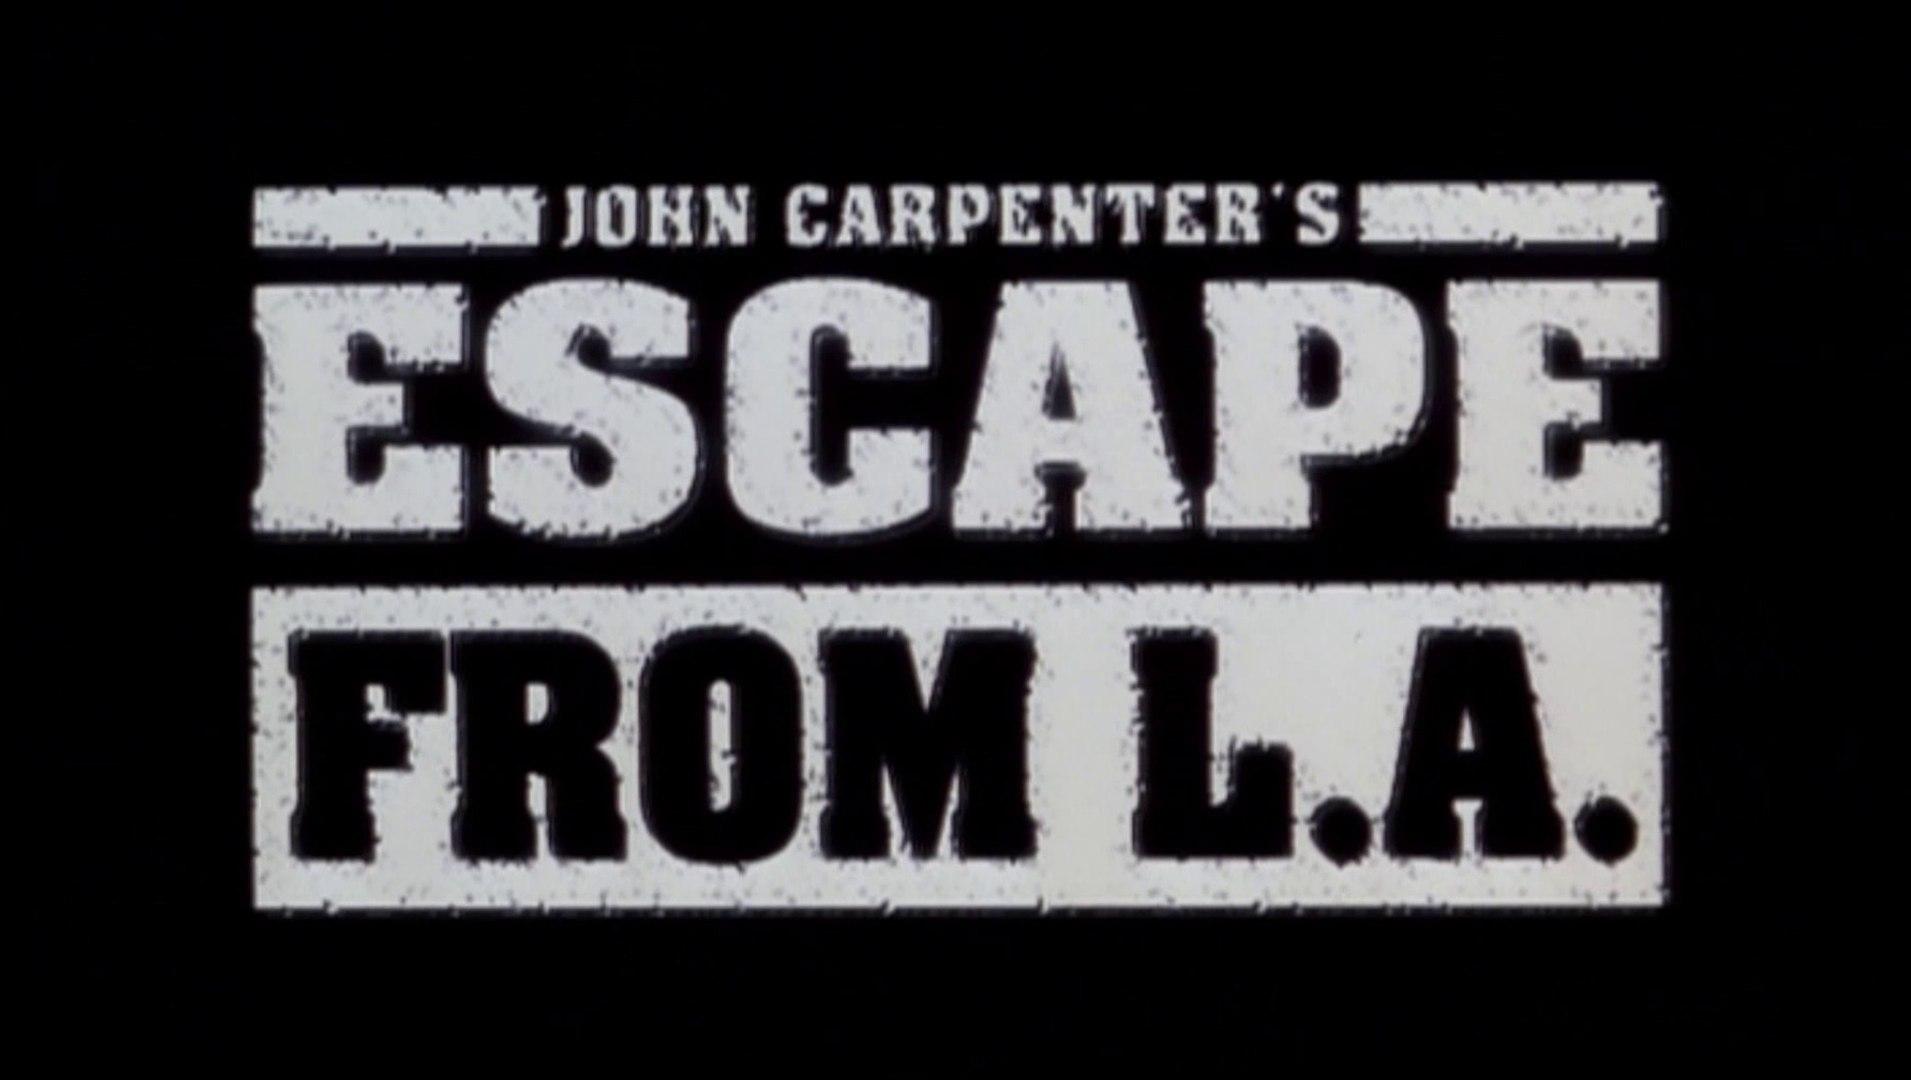 Escape from L.A. / Los Angeles 2013 (Trailer - Bande annonce OV Movies Version 1996) HD - HQ - 16.9